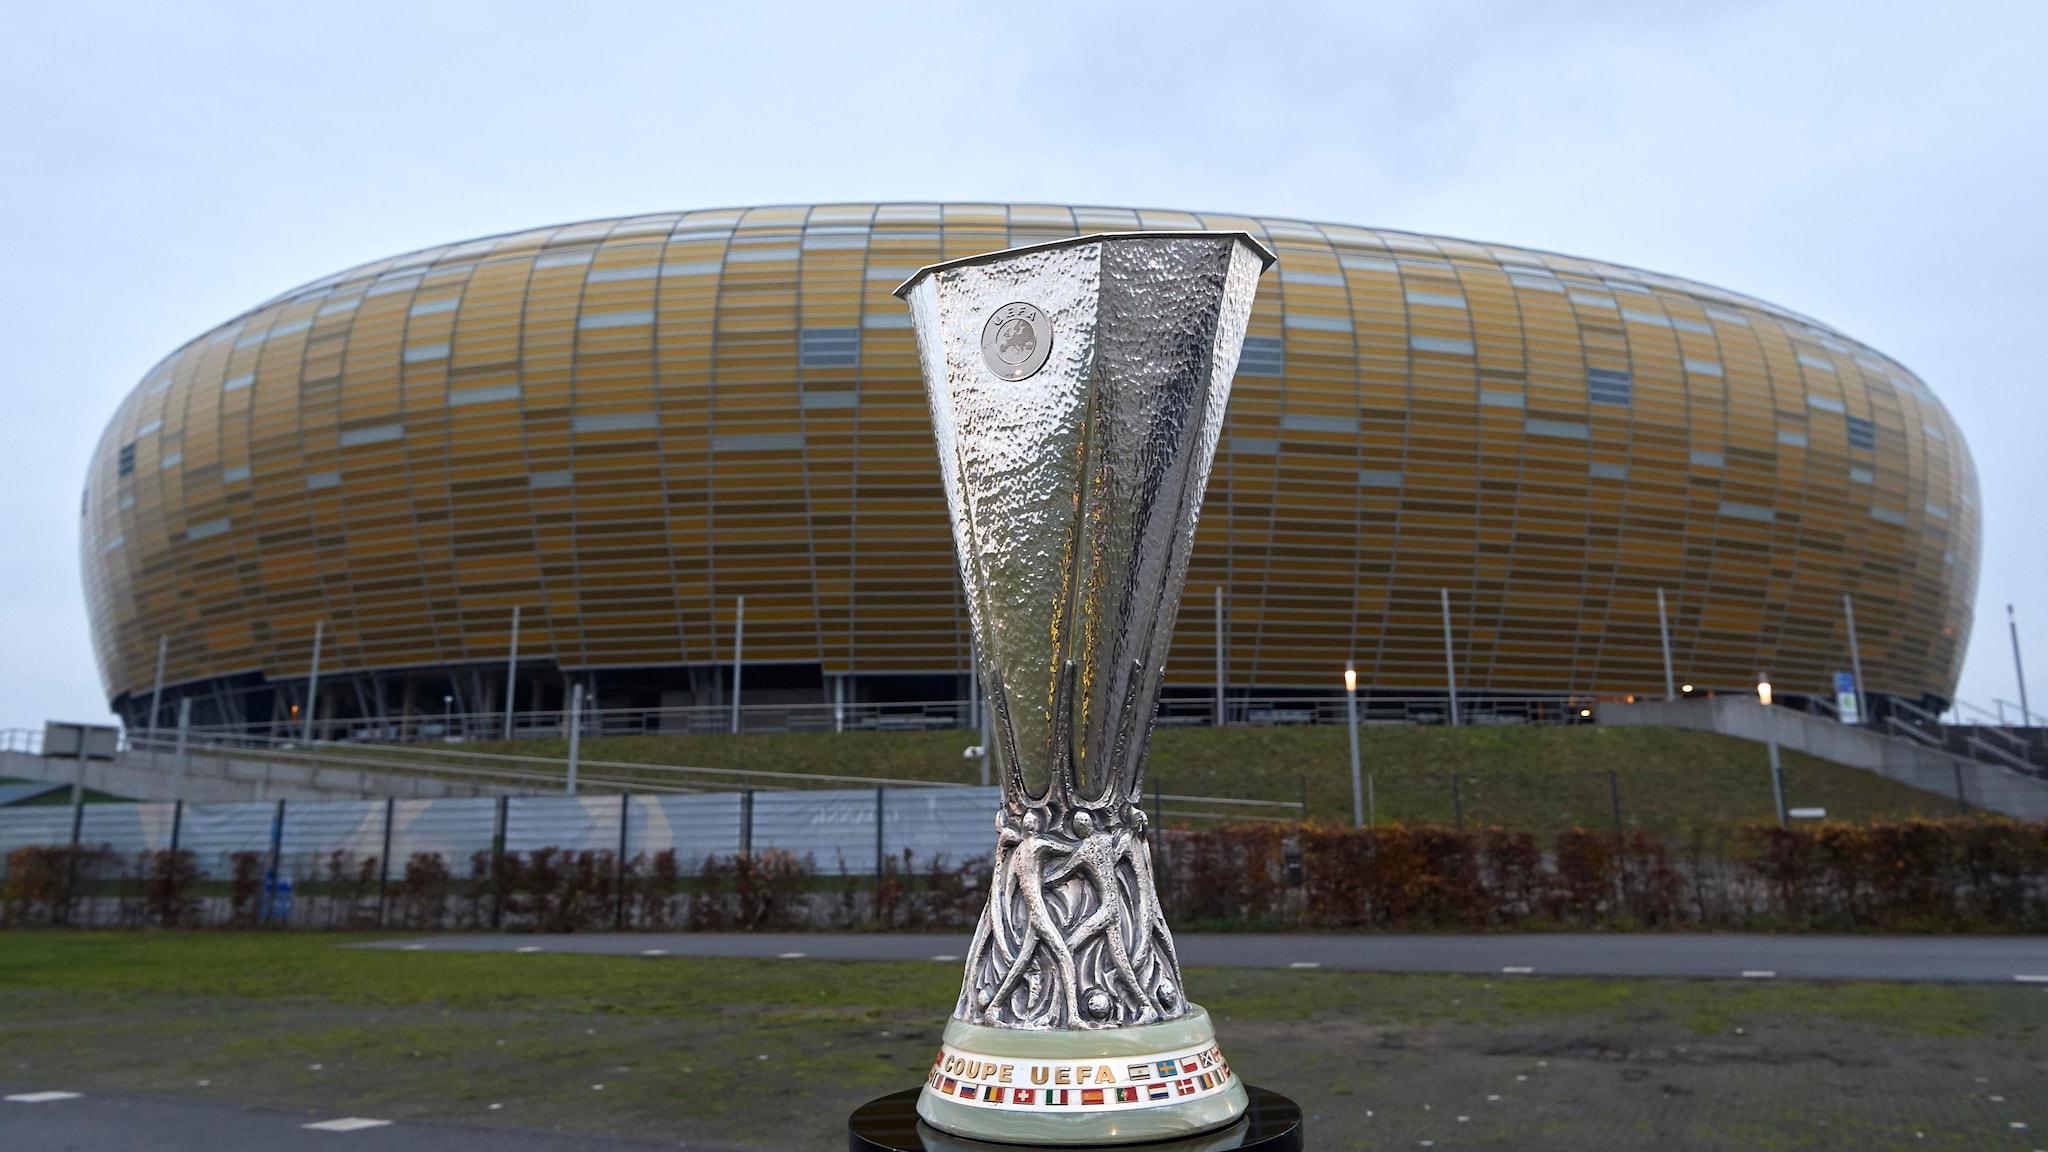 Uefa Europa League Final 2021 / 2020 2021 Uefa Europa ...